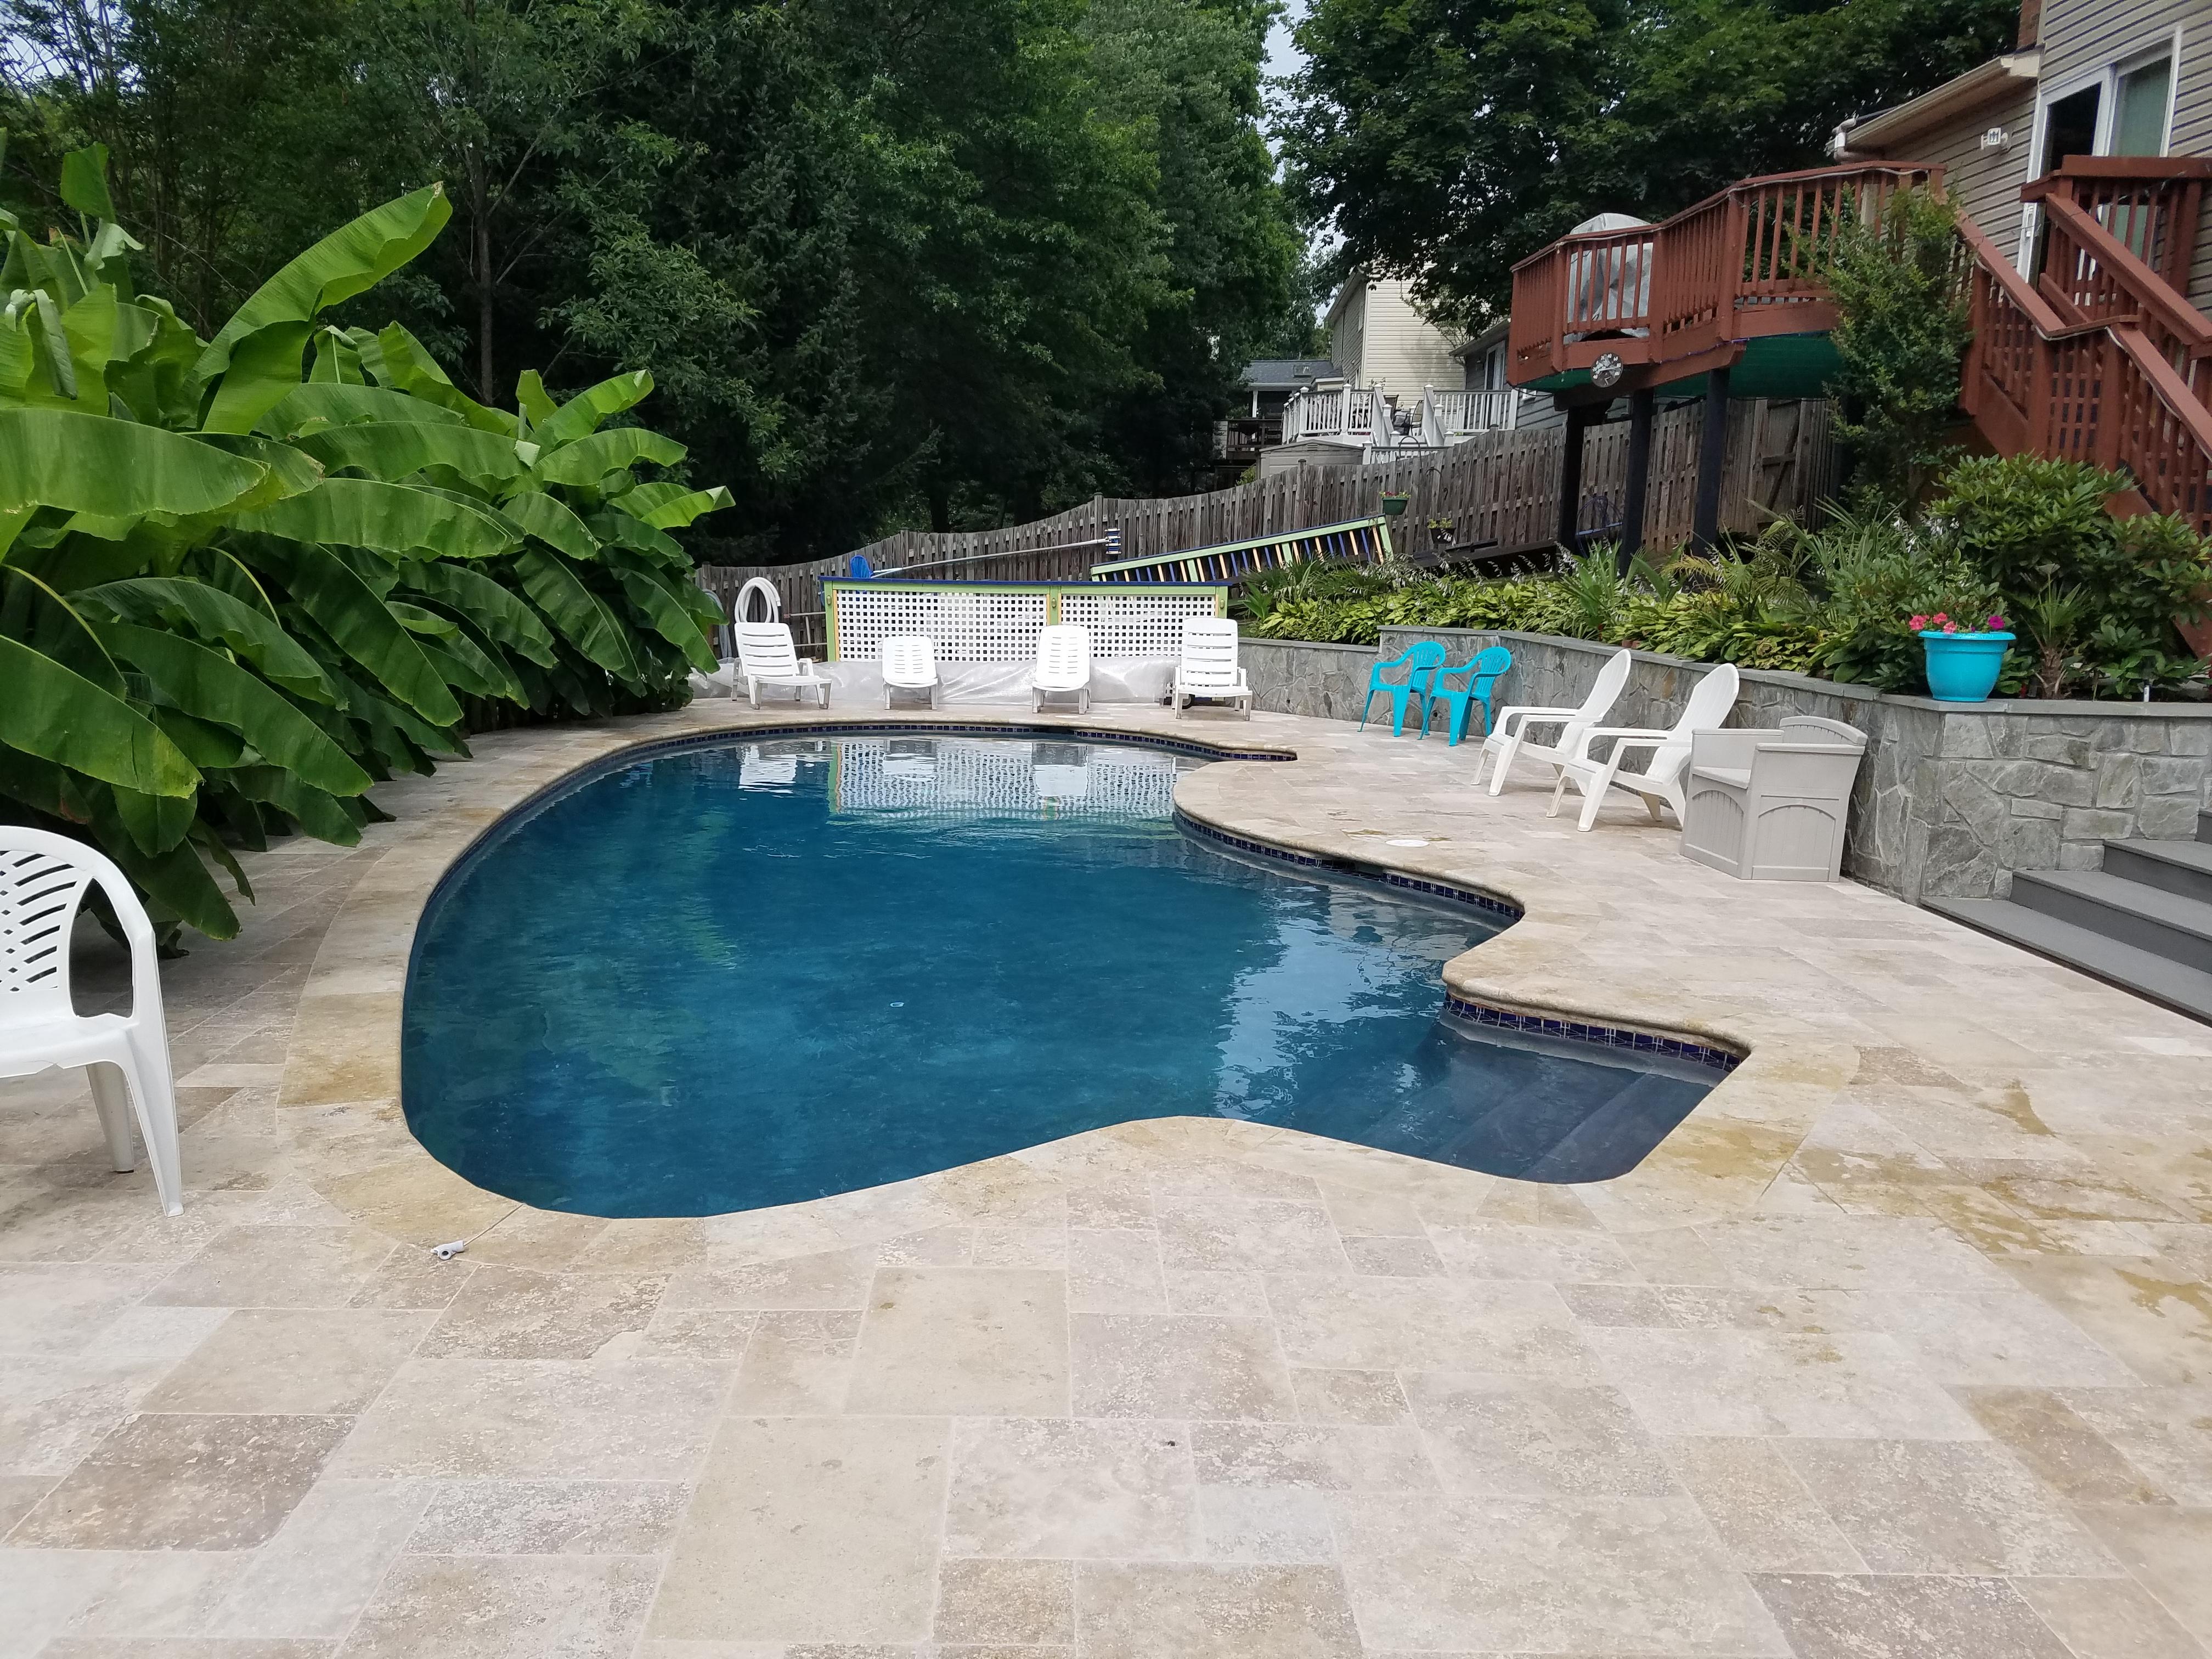 Travertine Pool Deck - Portfolio - Phoenix Home Services, Inc.